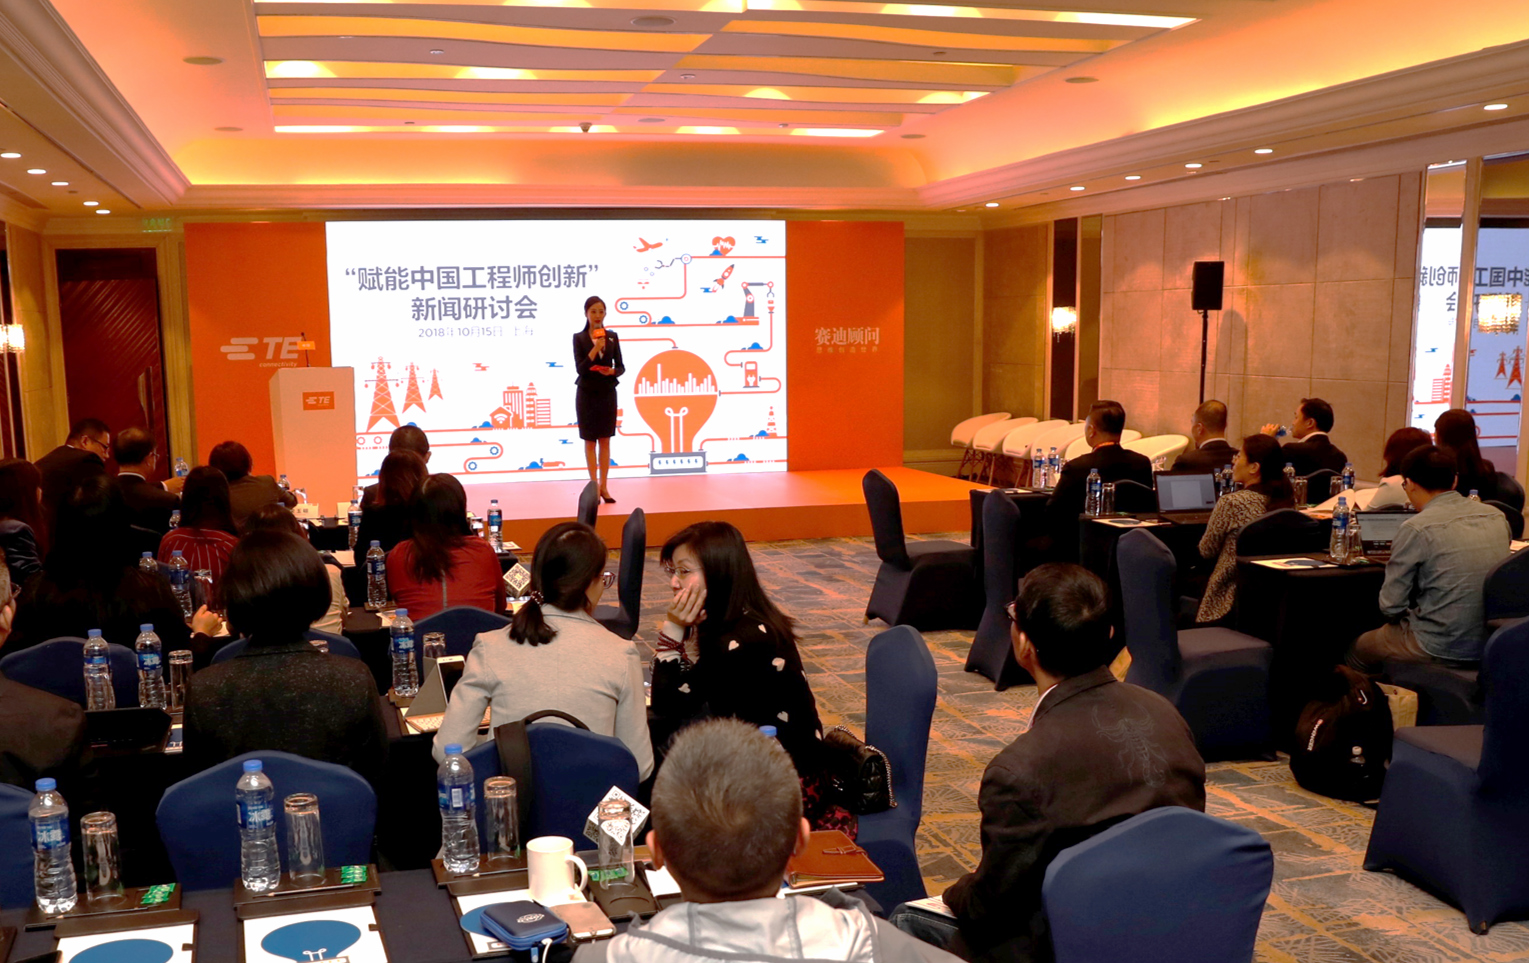 TE Connectivity 与赛迪顾问联合发布《2018中国工程师创新能量指数报告》